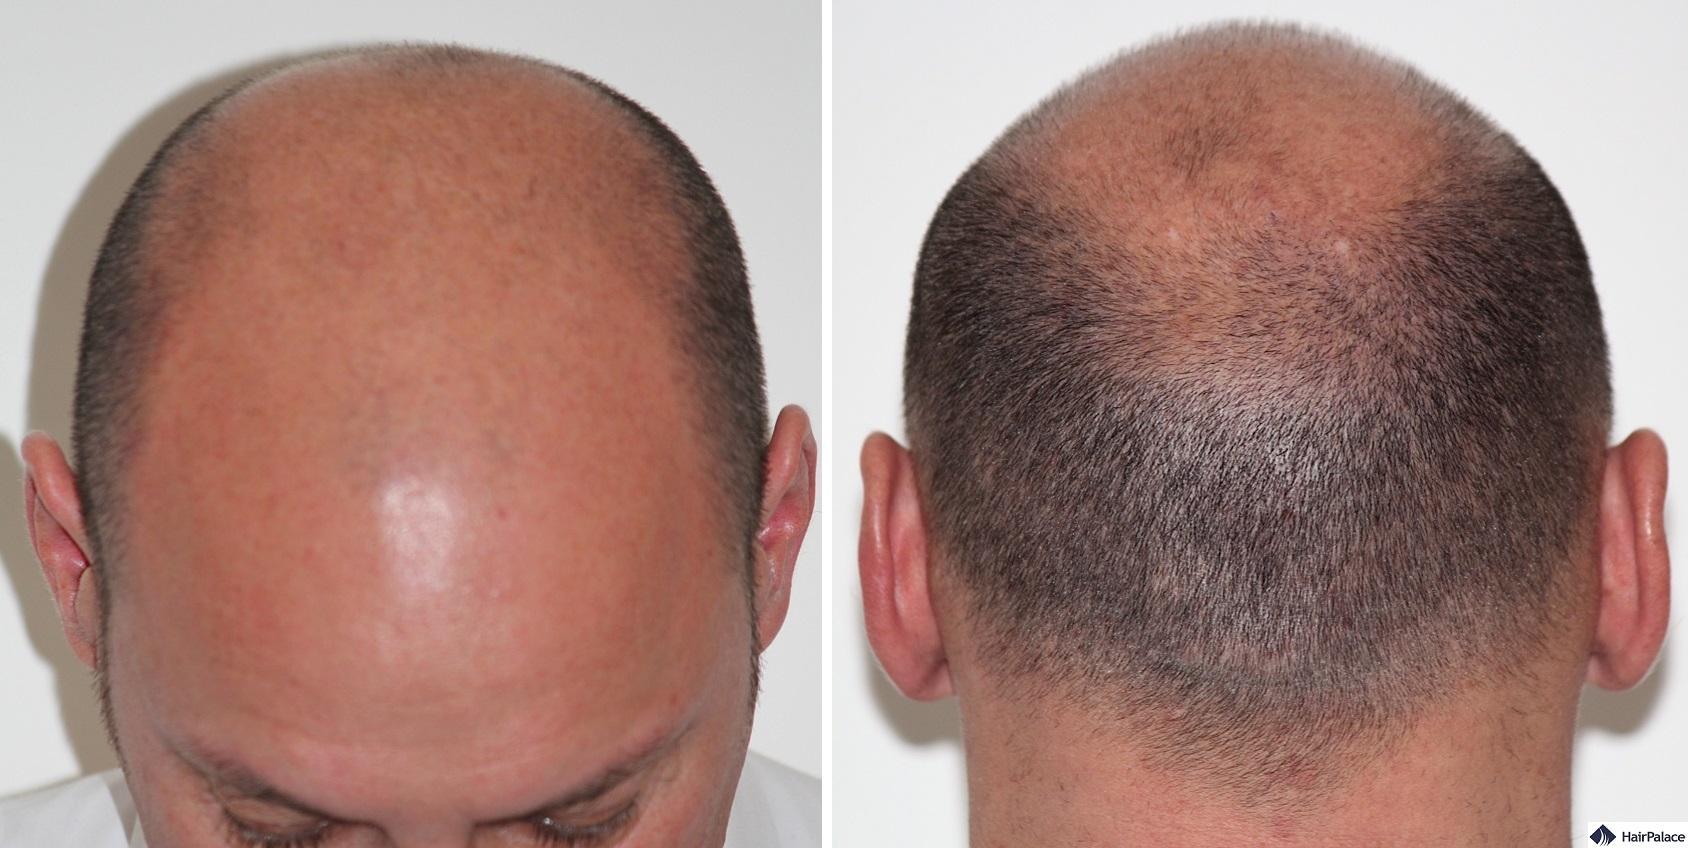 Xavier before the hair transplant